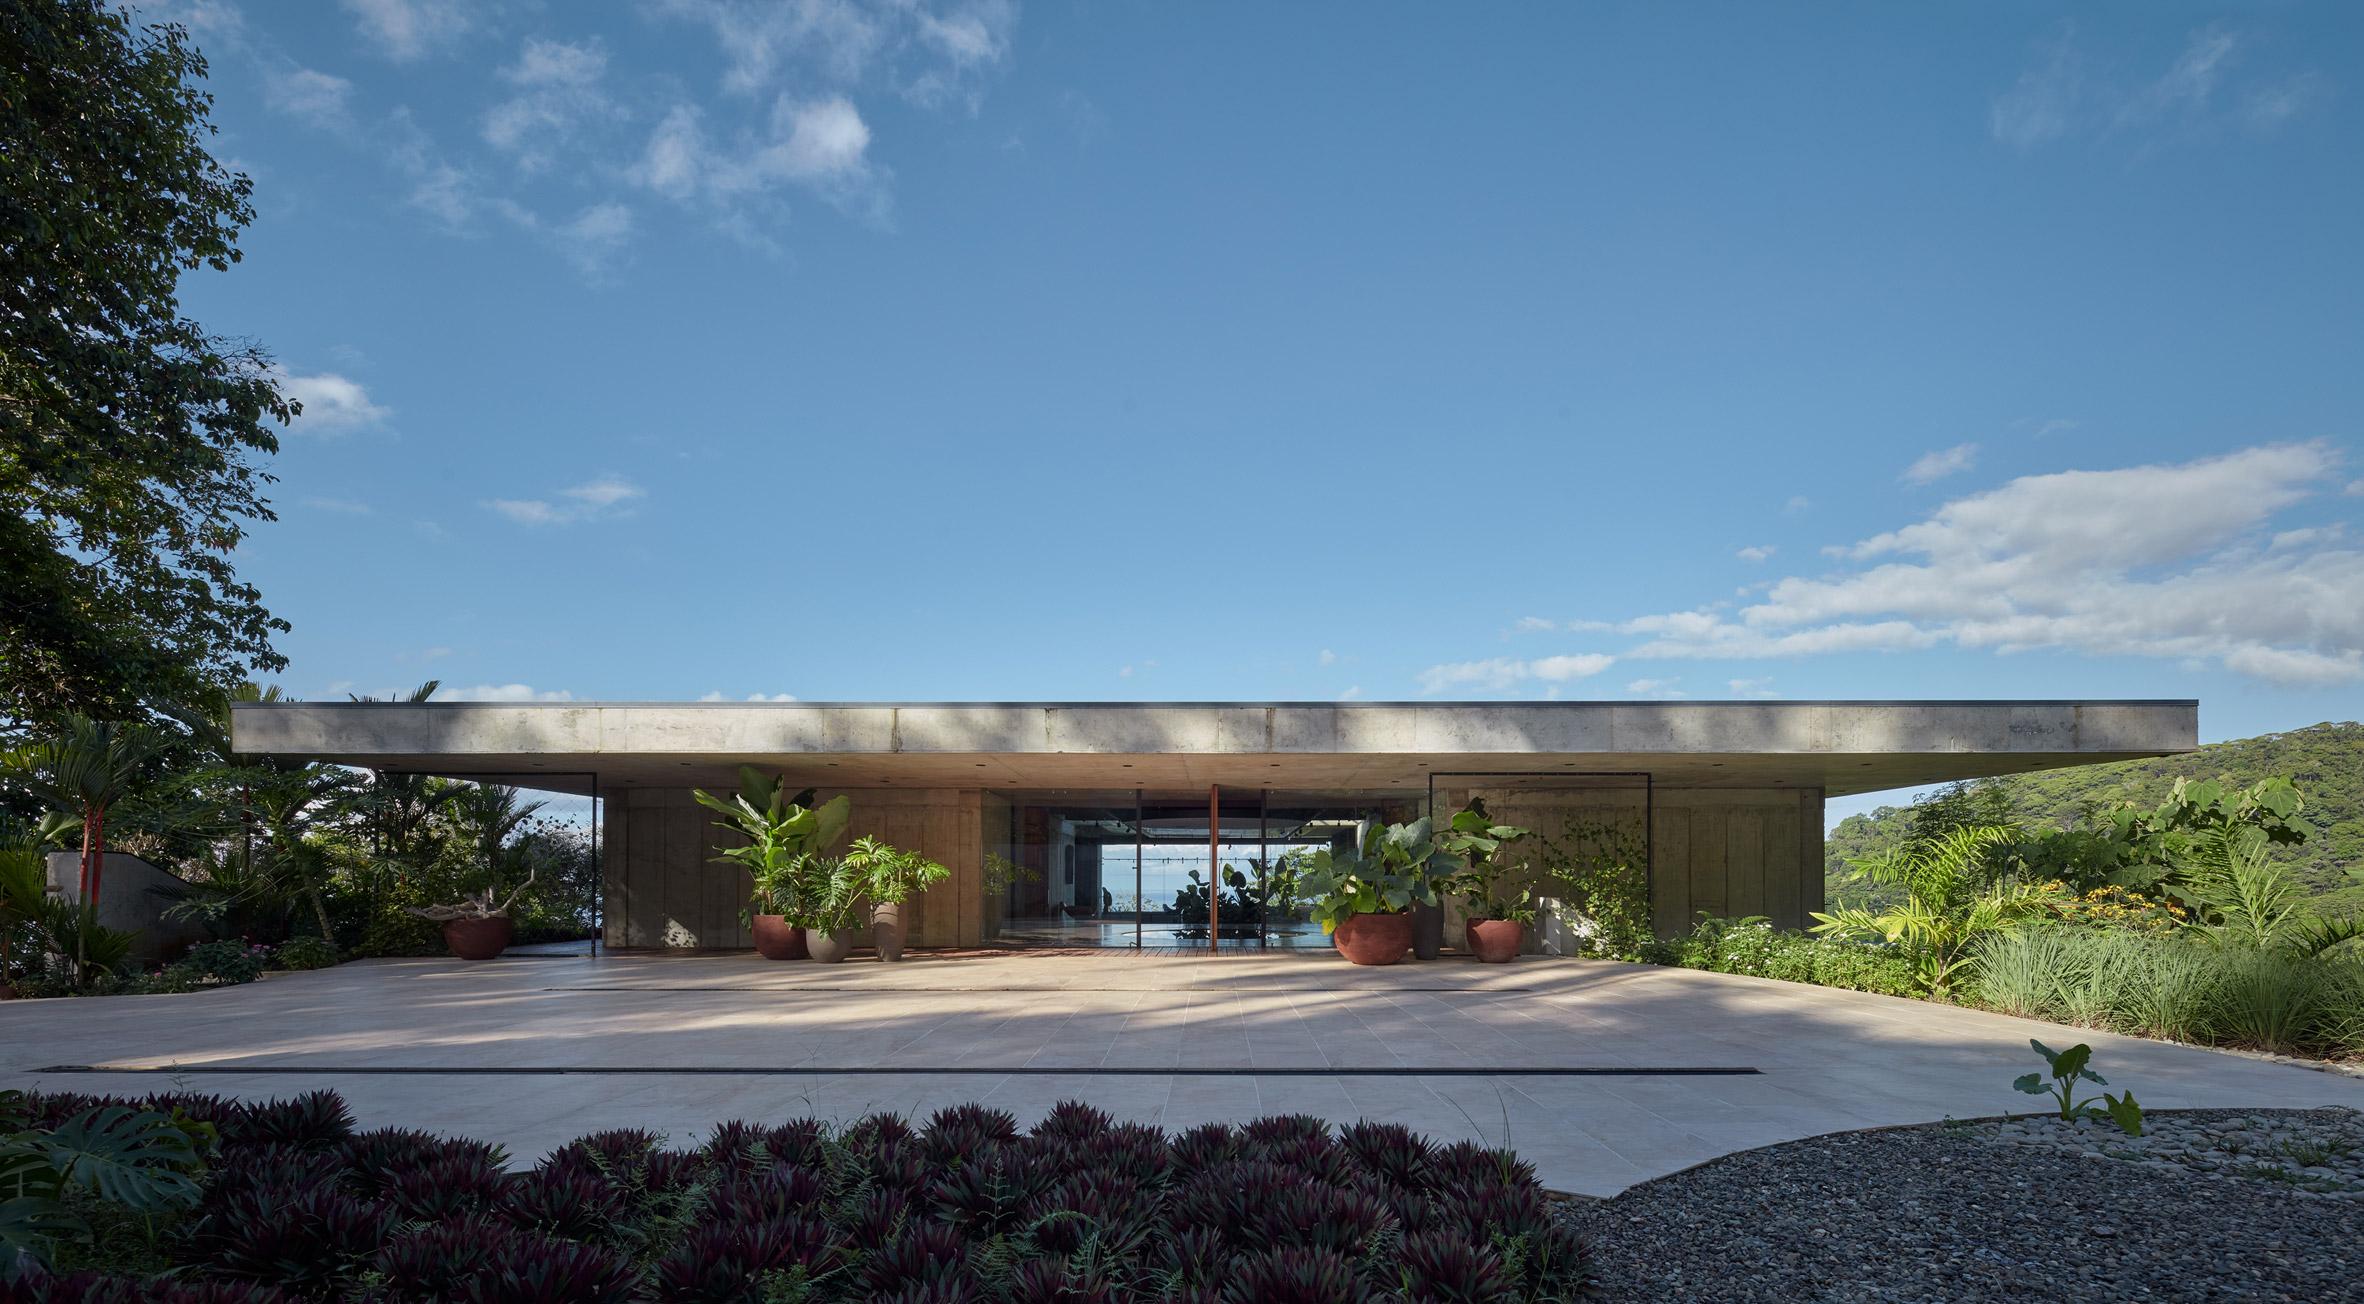 Art Villa by Refuel works